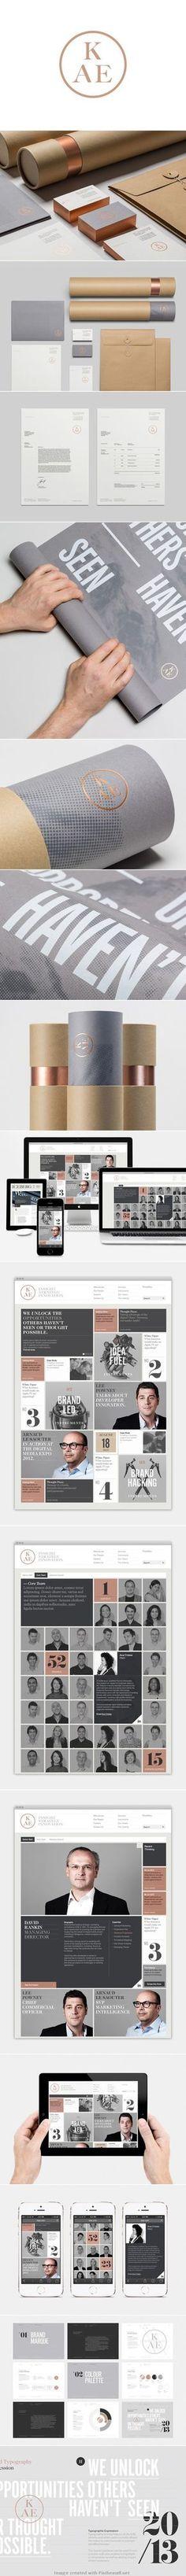 KAE | Socio Design | #stationary #corporate #design #corporatedesign #identity #branding #marketing < repinned by www.BlickeDeeler.de | Visit our website: www.blickedeeler.de/leistungen/corporate-design